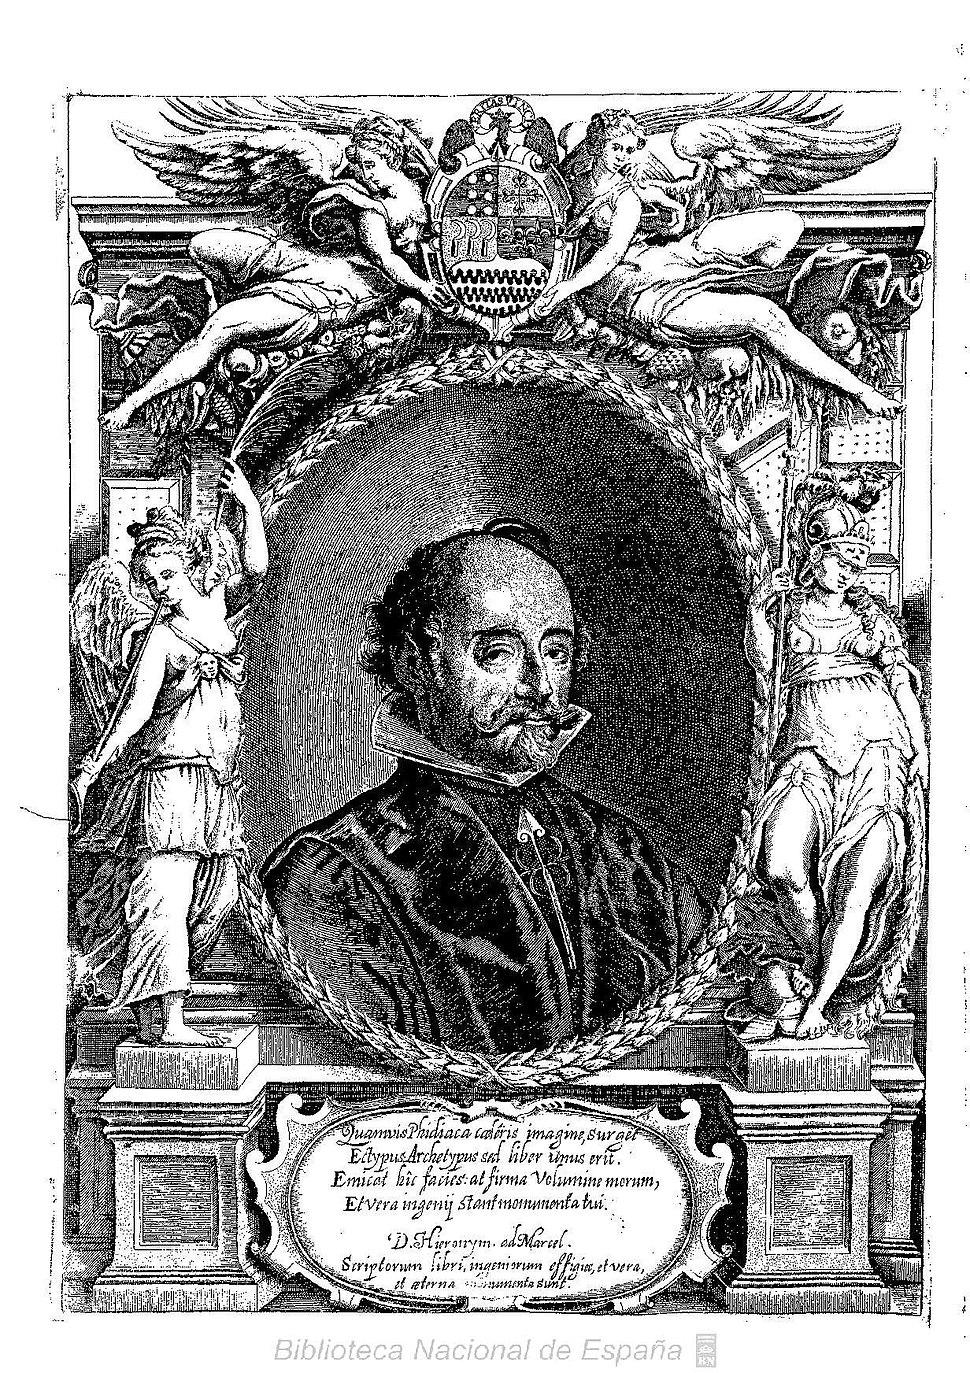 Politica indianapor Iuan de Solorzano Pereira